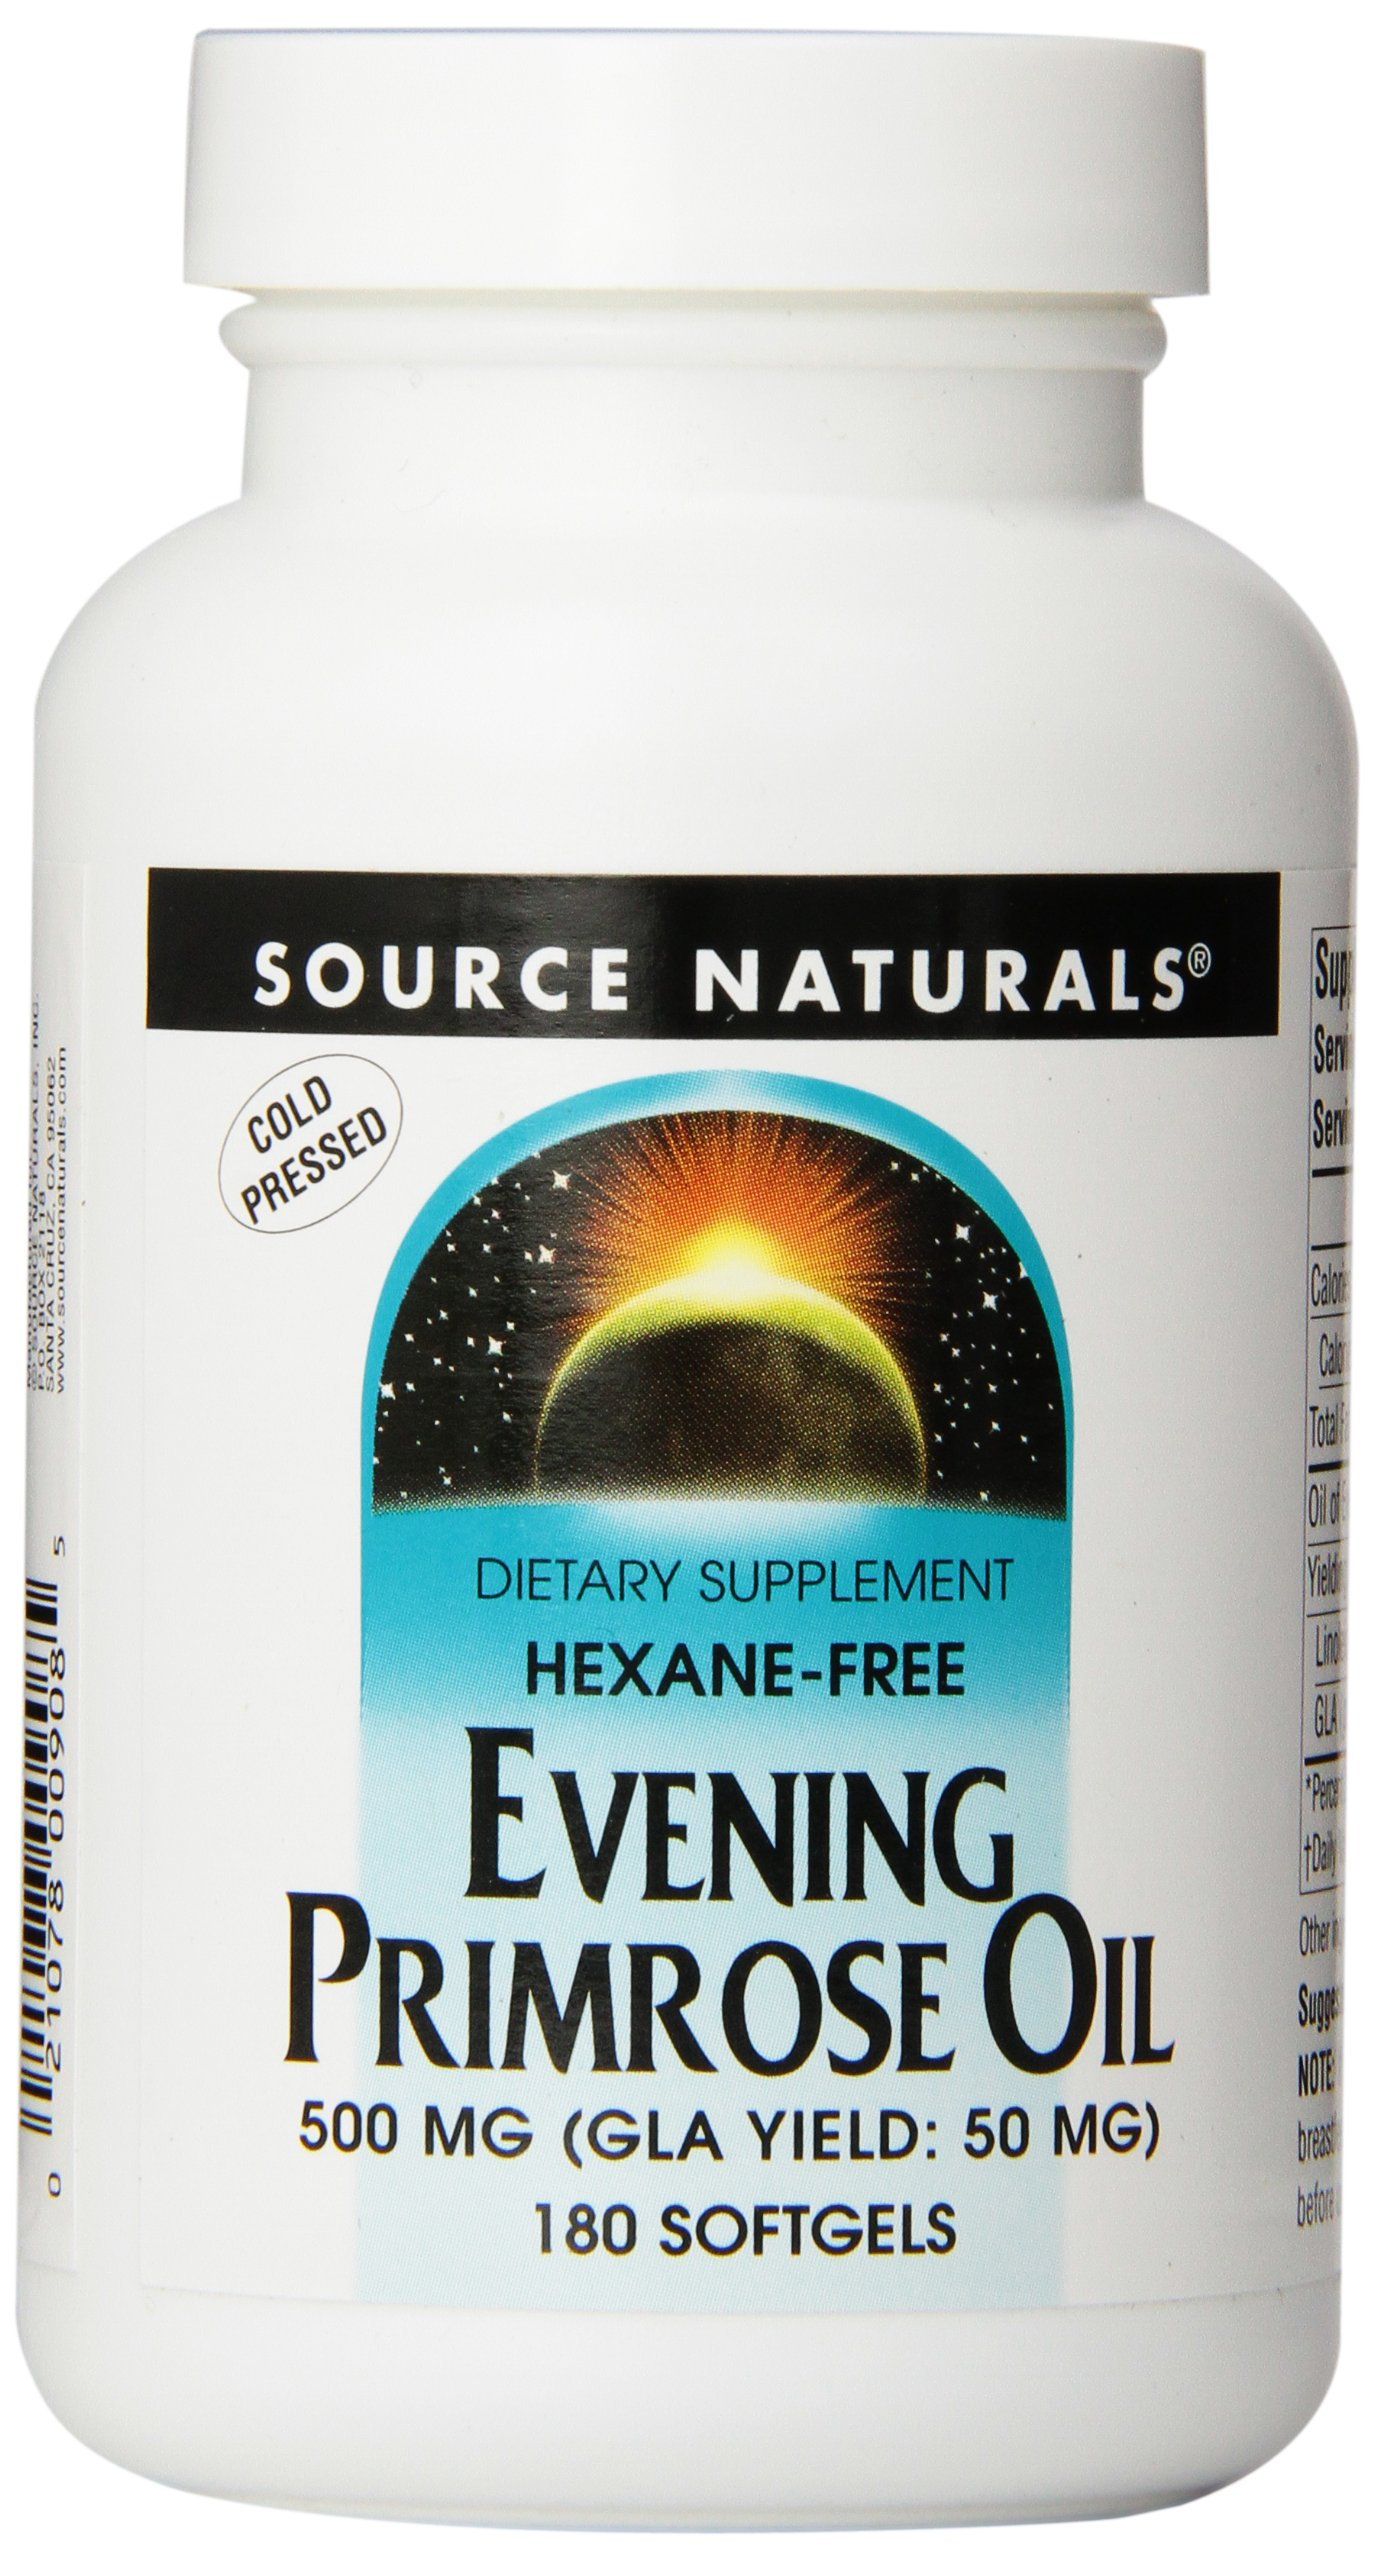 Source Naturals Evening Primrose Oil 500mg (50mg GLA) Cold-Pressed, Hexane-Free Source of Fatty-Acid Gamma-Linolenic & Linoleic Acid - 180 Softgels